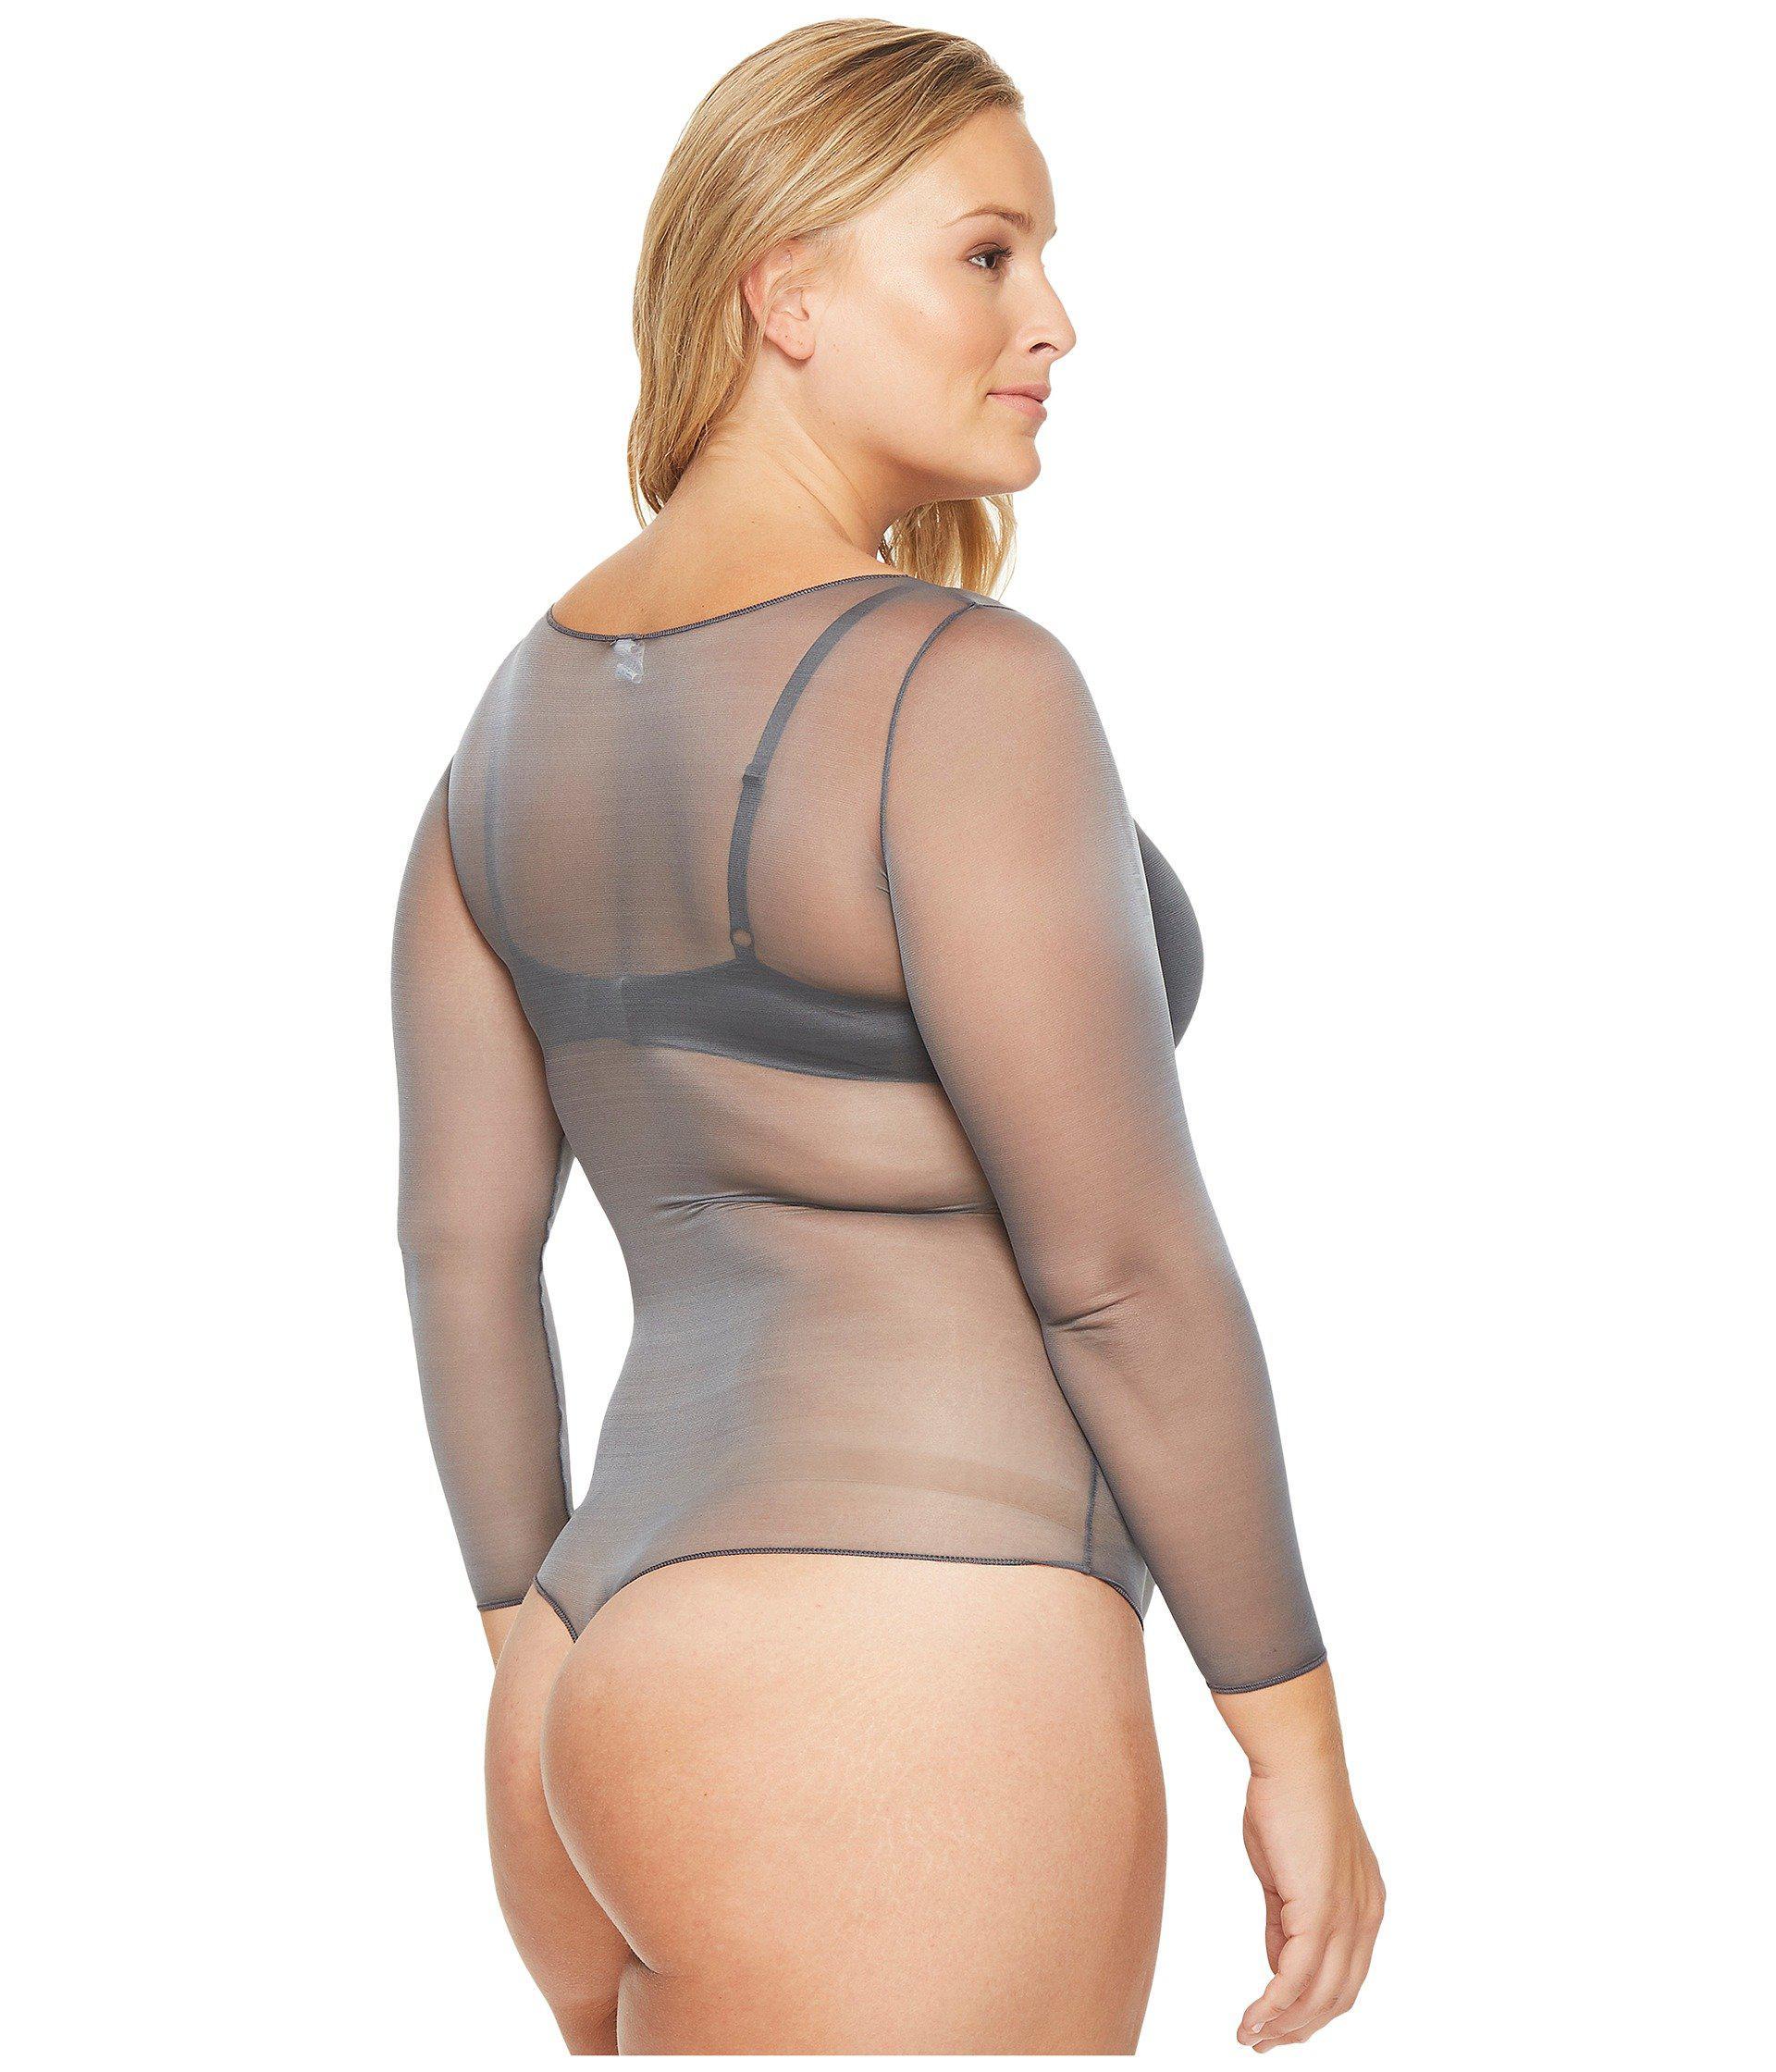 9a12e45873d Spanx Plus Size Sheer Fashion Mesh Thong Bodysuit in Gray - Lyst